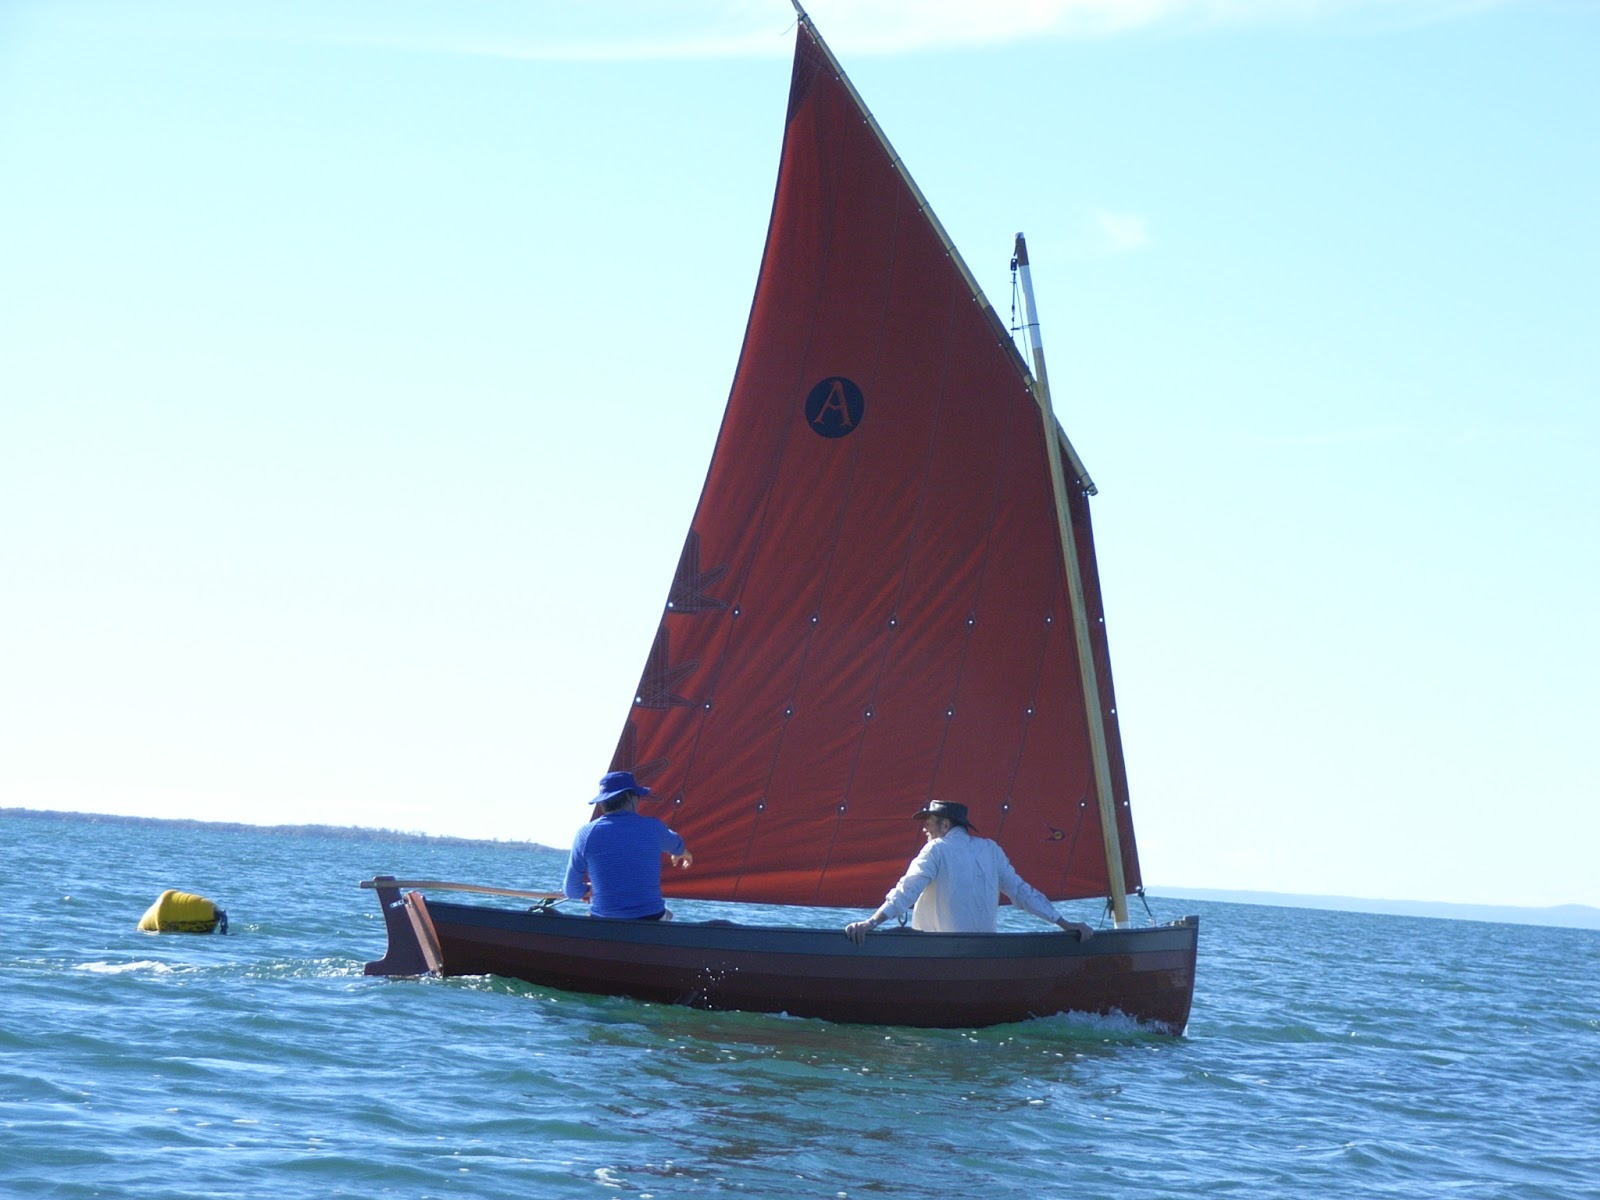 Ross Lillistone Wooden Boats: Balance Lug - Rigging Details